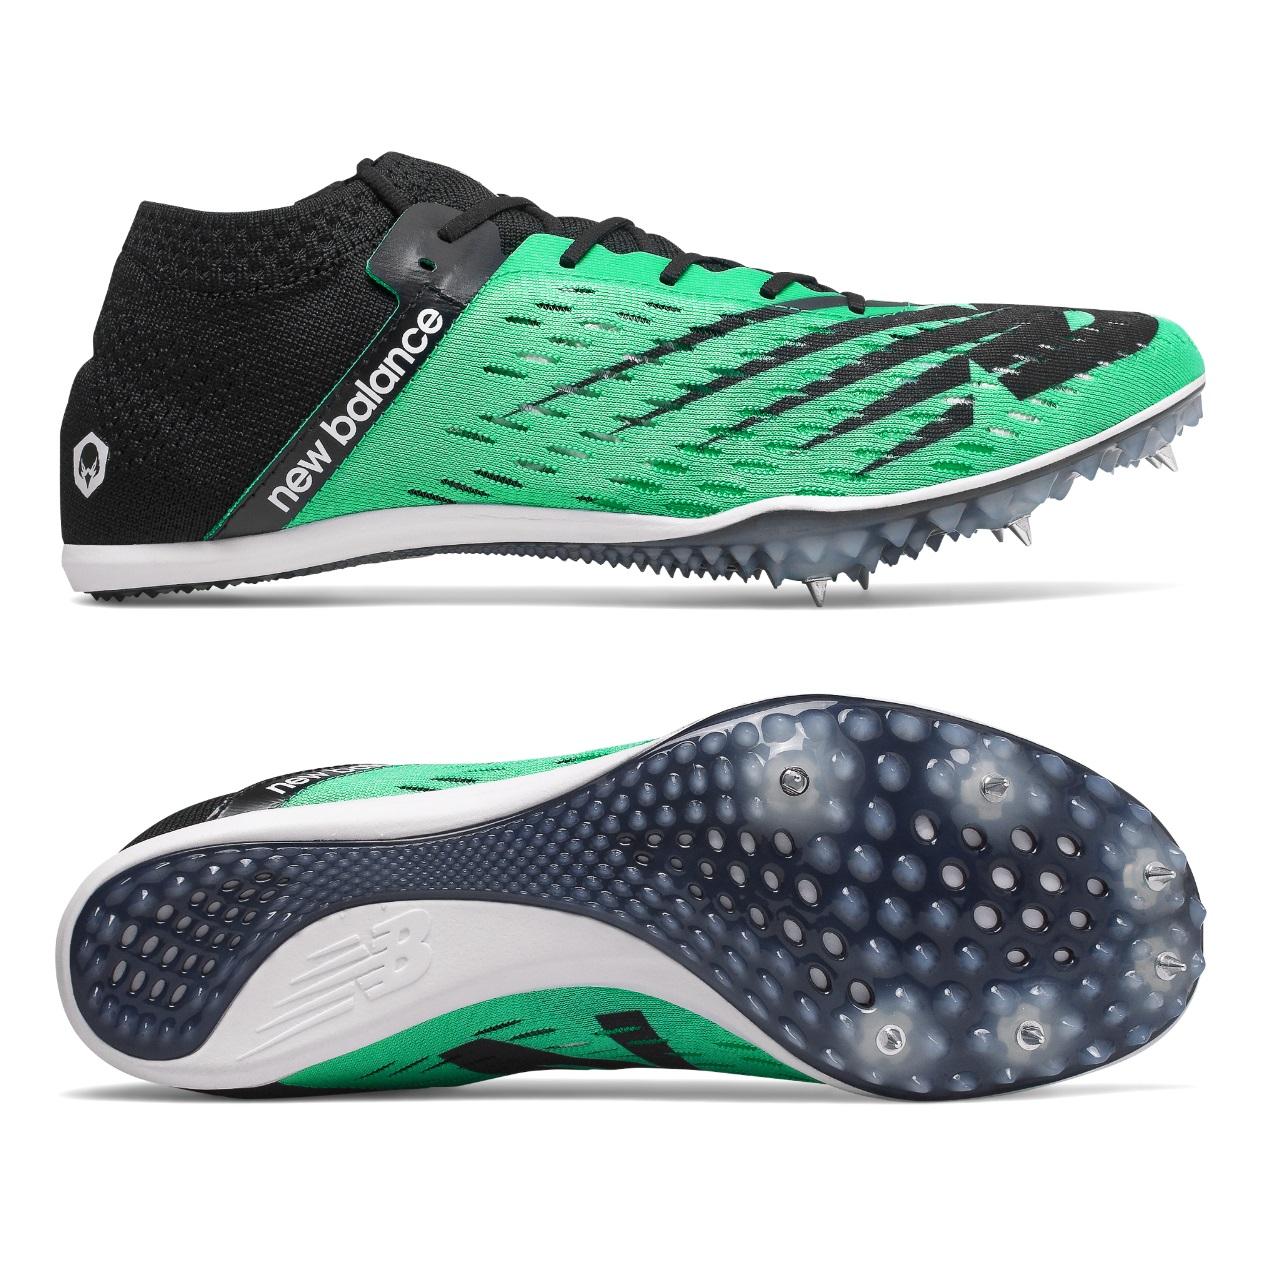 scarpe chiodate atletica new balance,sirpizzaky.com